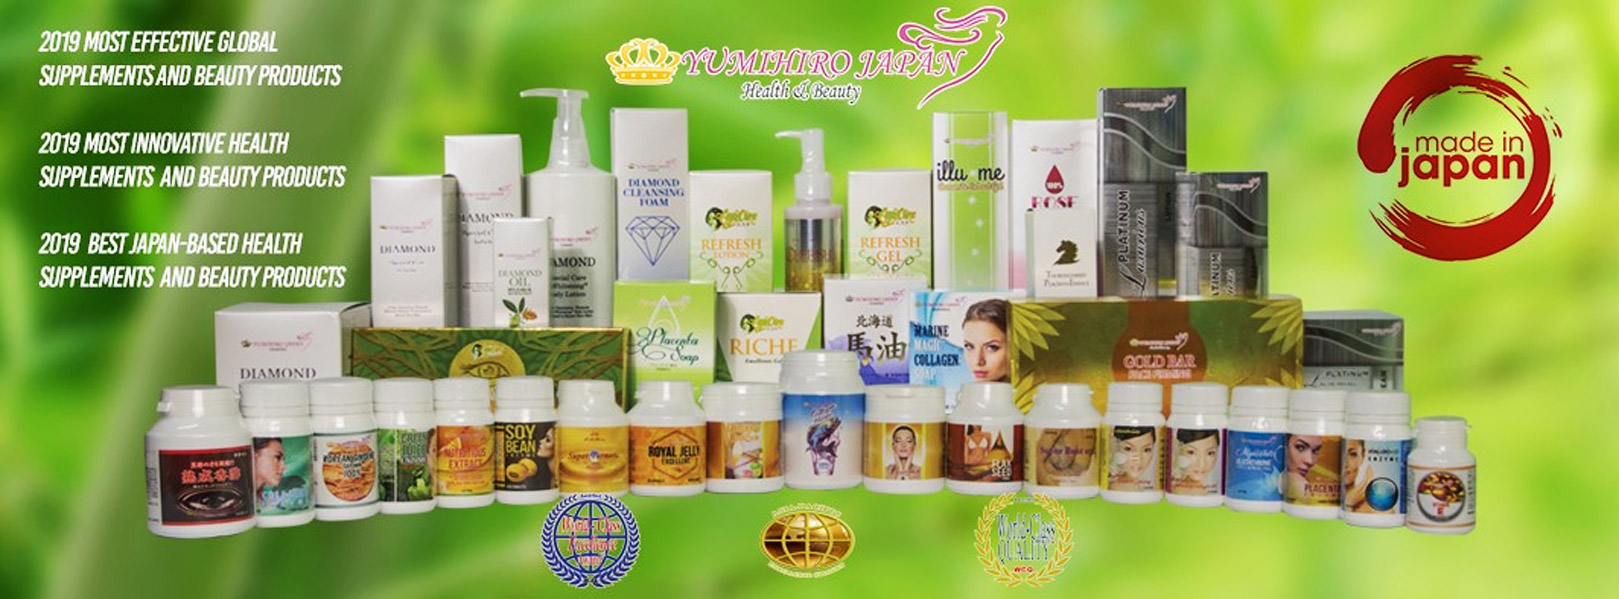 Made in Japan化粧品とサプリメント